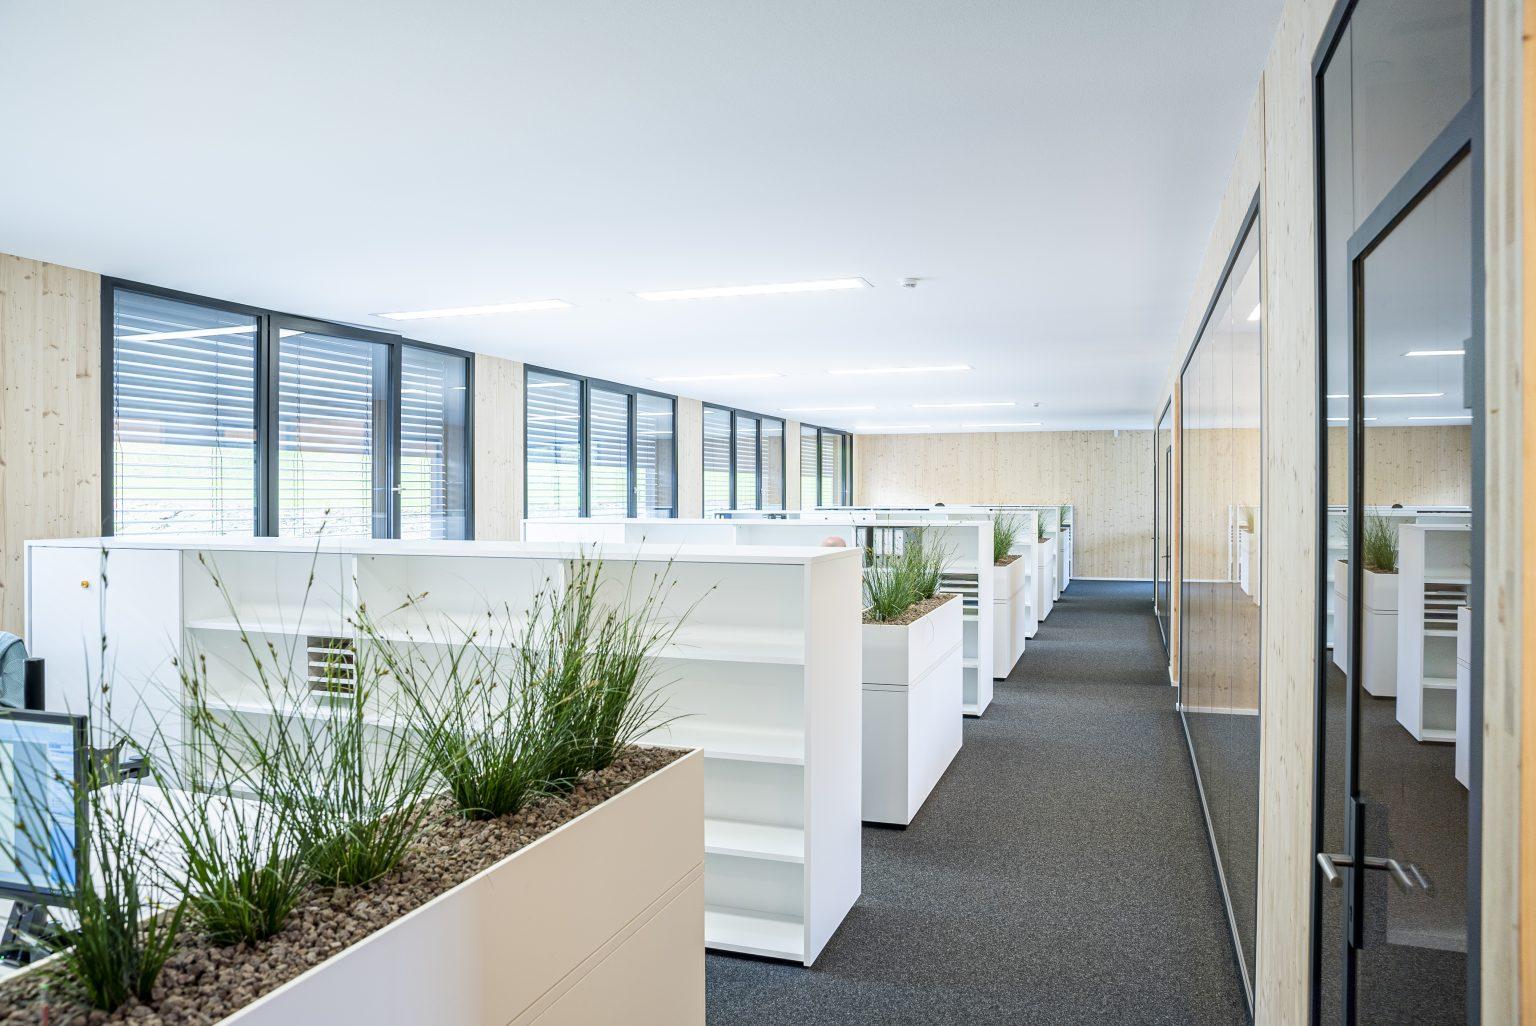 Bürogebäude_Zick-Hessler_Holzbauweise (37)